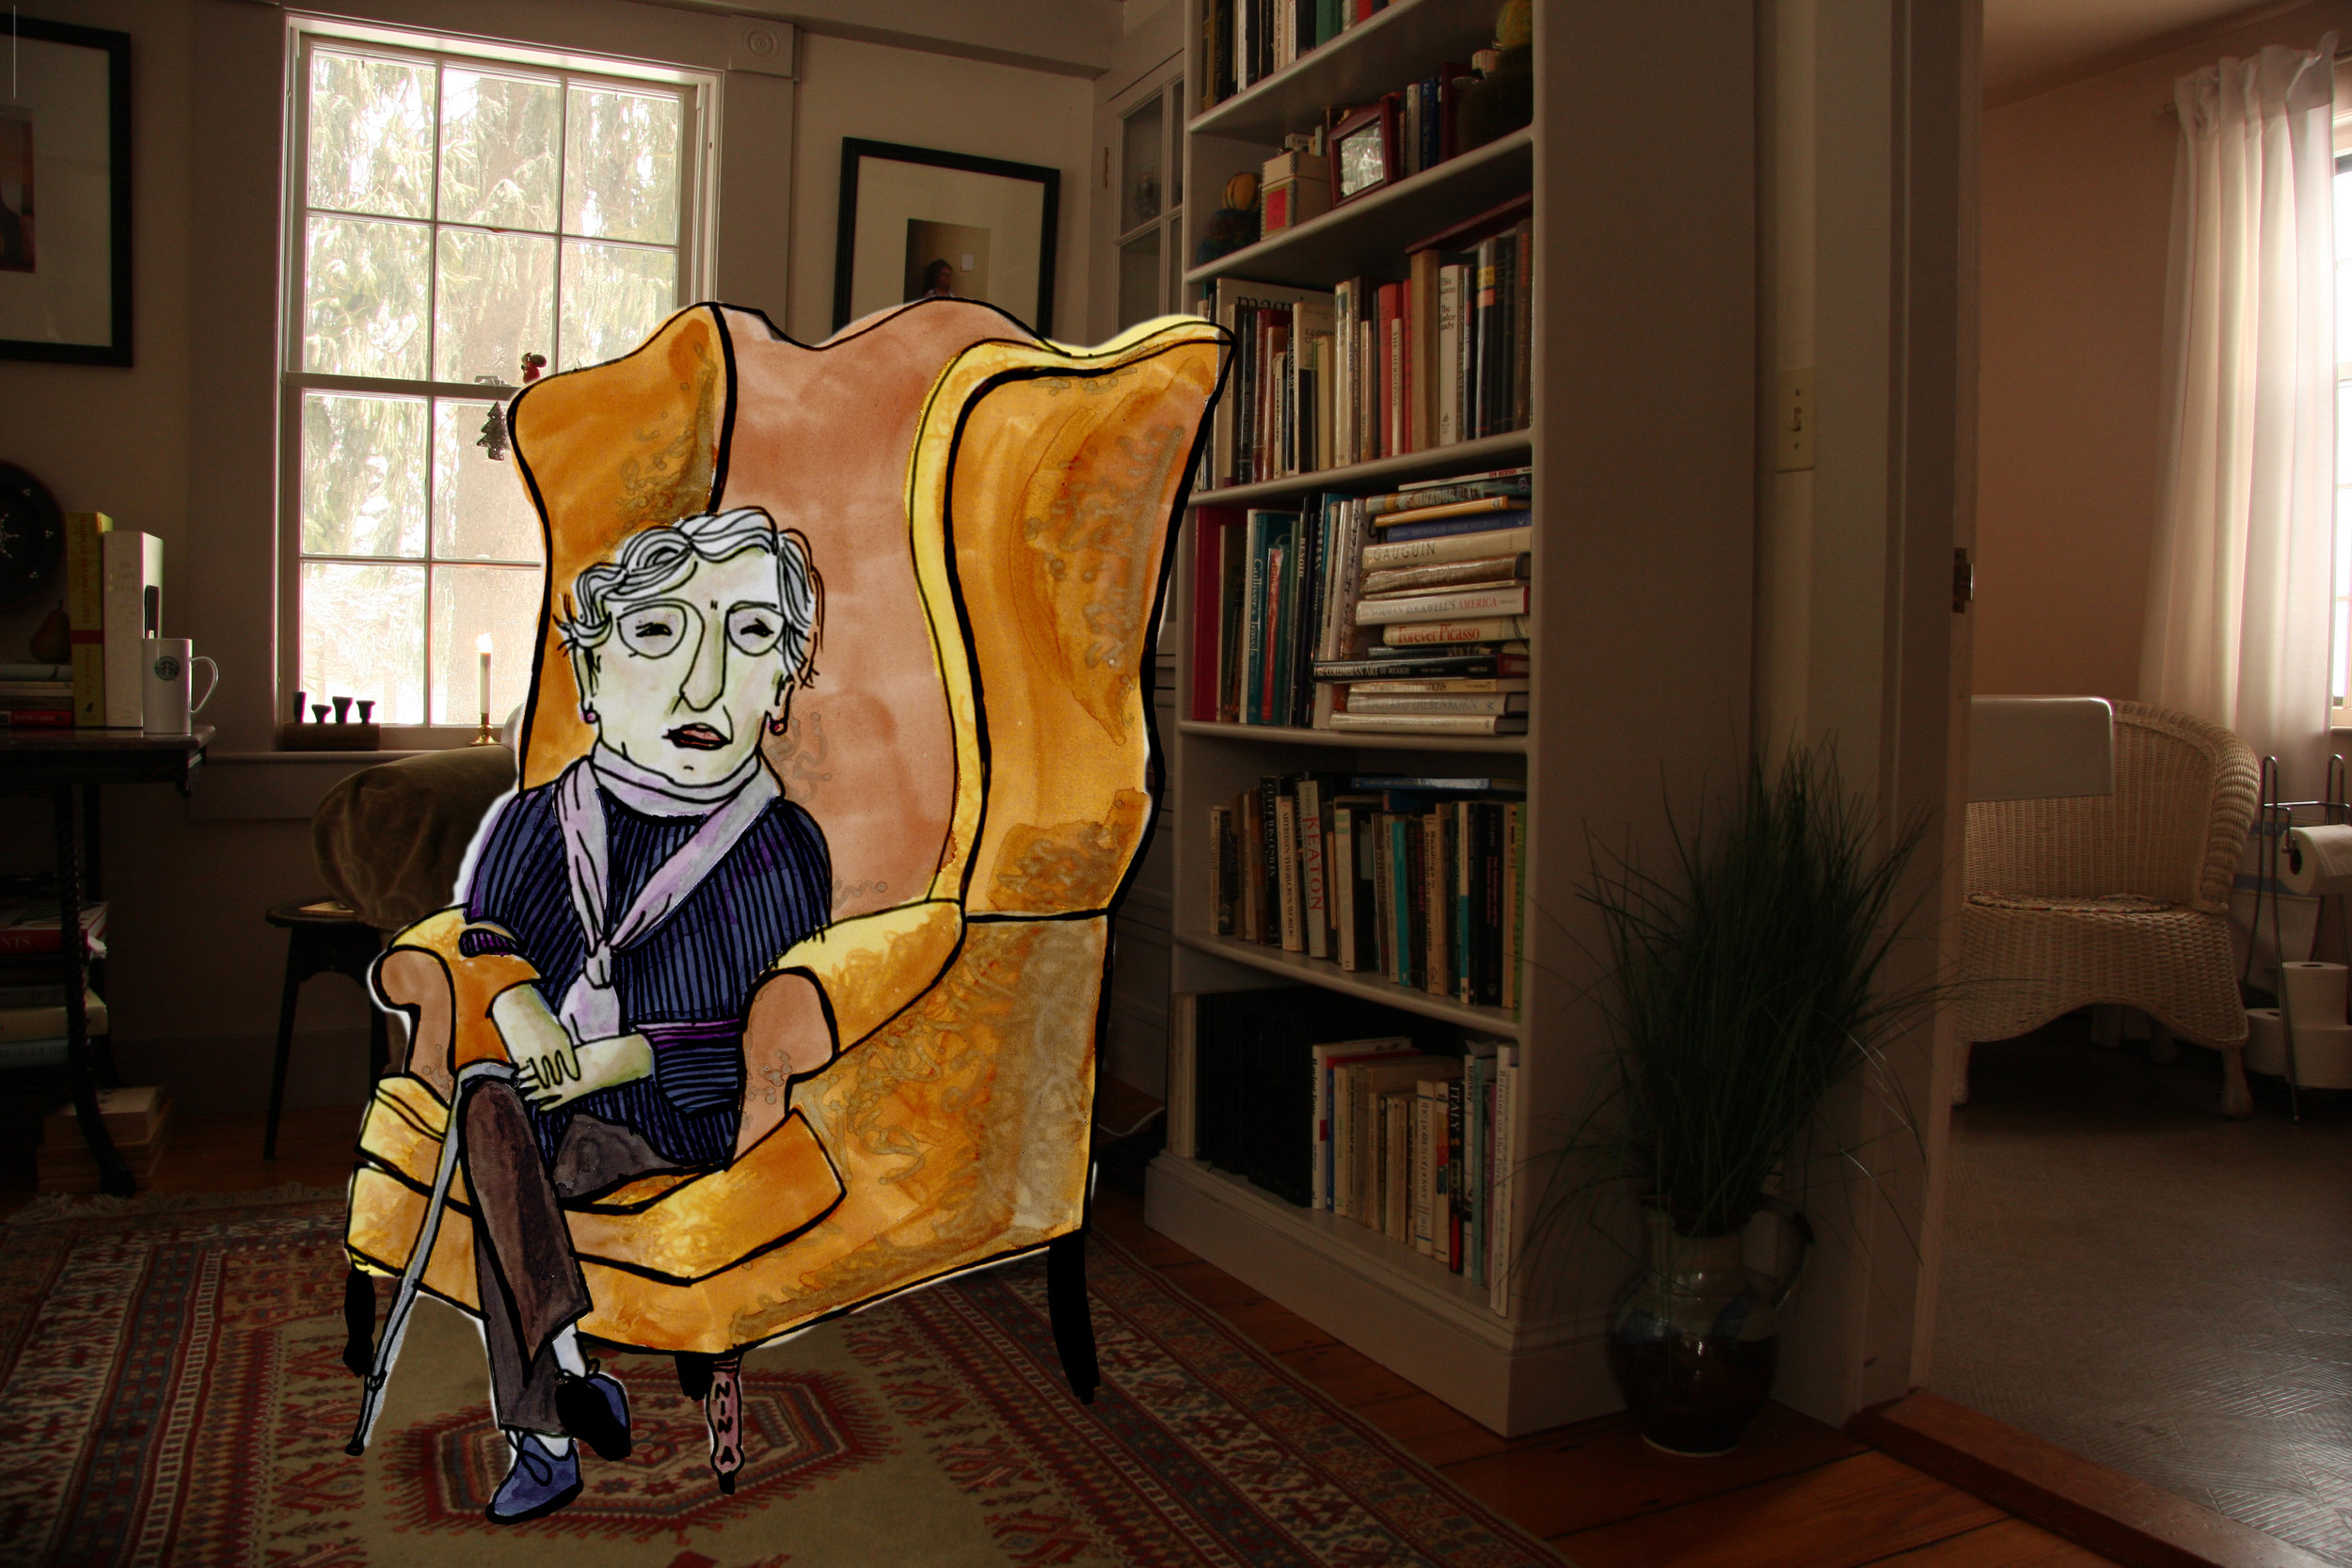 gram on the chair.jpg